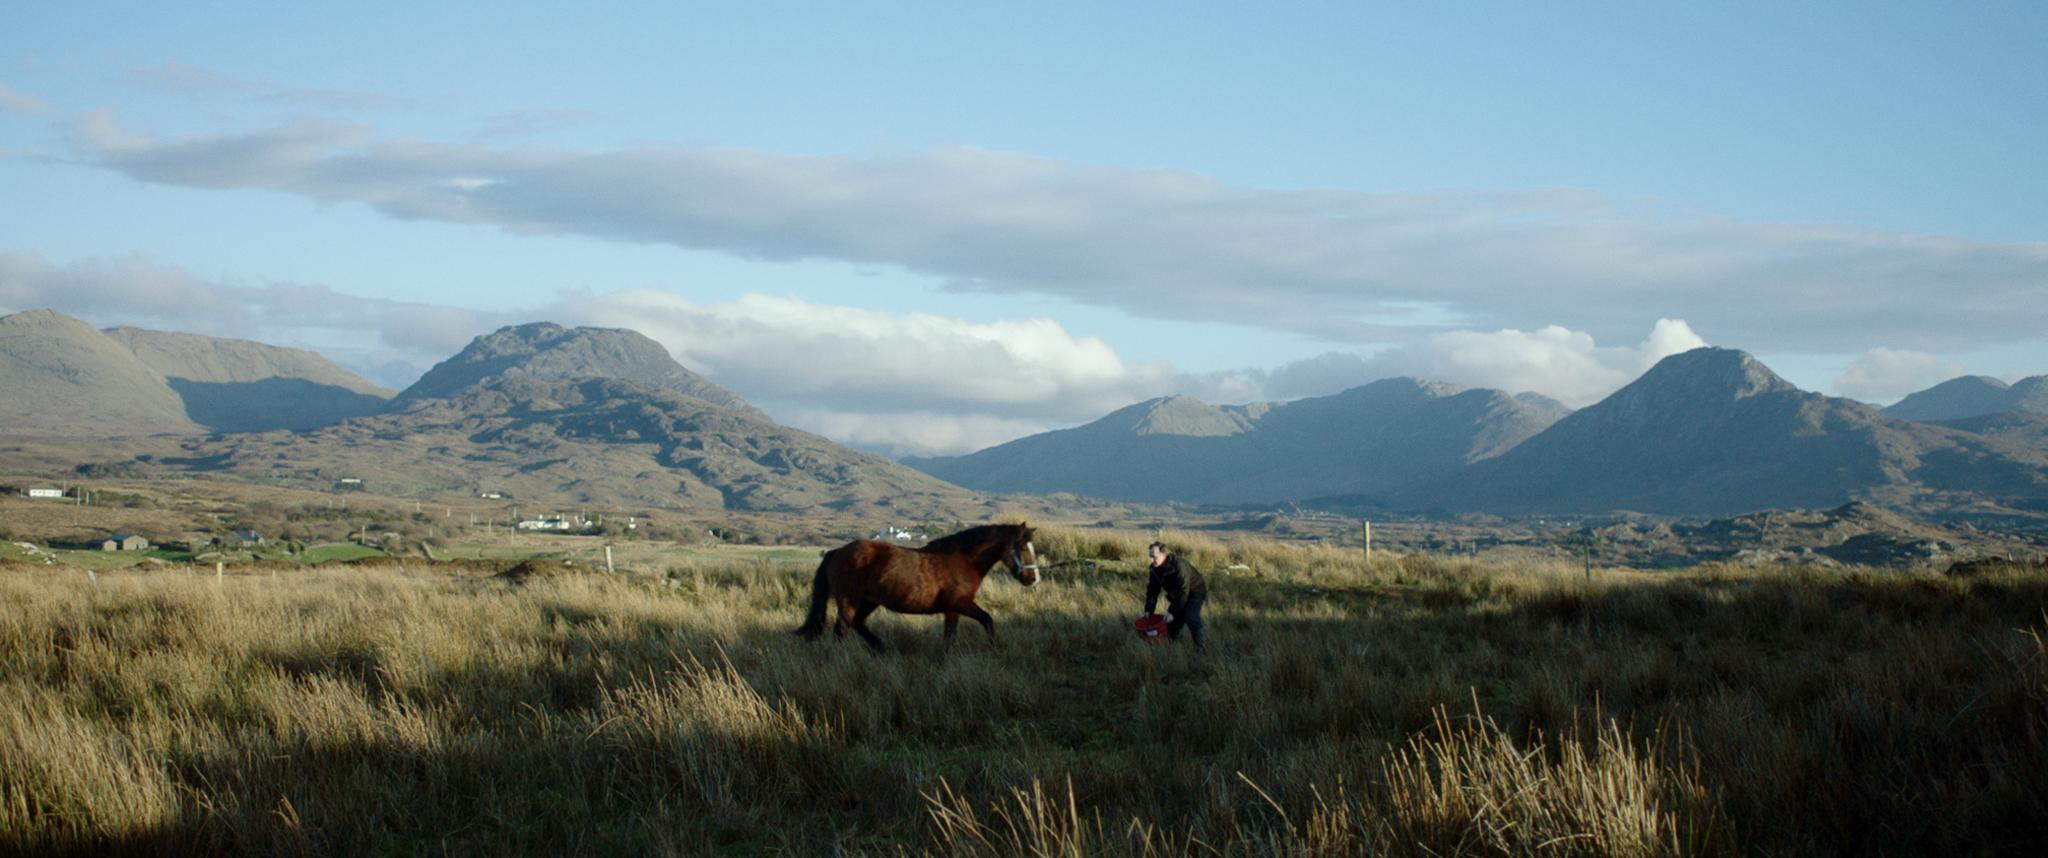 West of Ireland Cinematographers and Short Film Ciúnas Feature in WRAP Spotlight & Watchlist